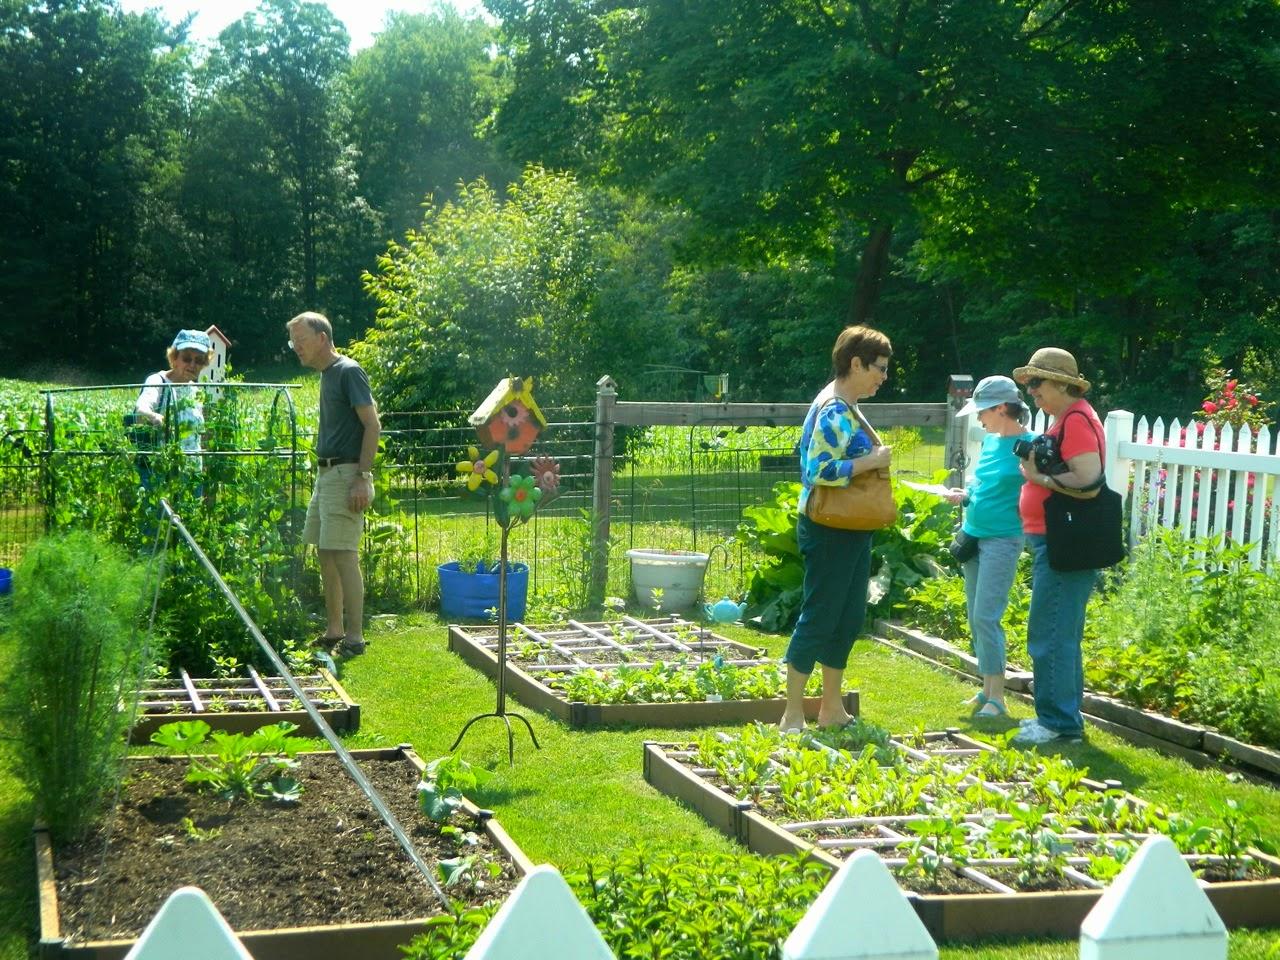 Kitchen Garden Foundation Pams English Cottage Garden Celebrating The Arrival Of Summer